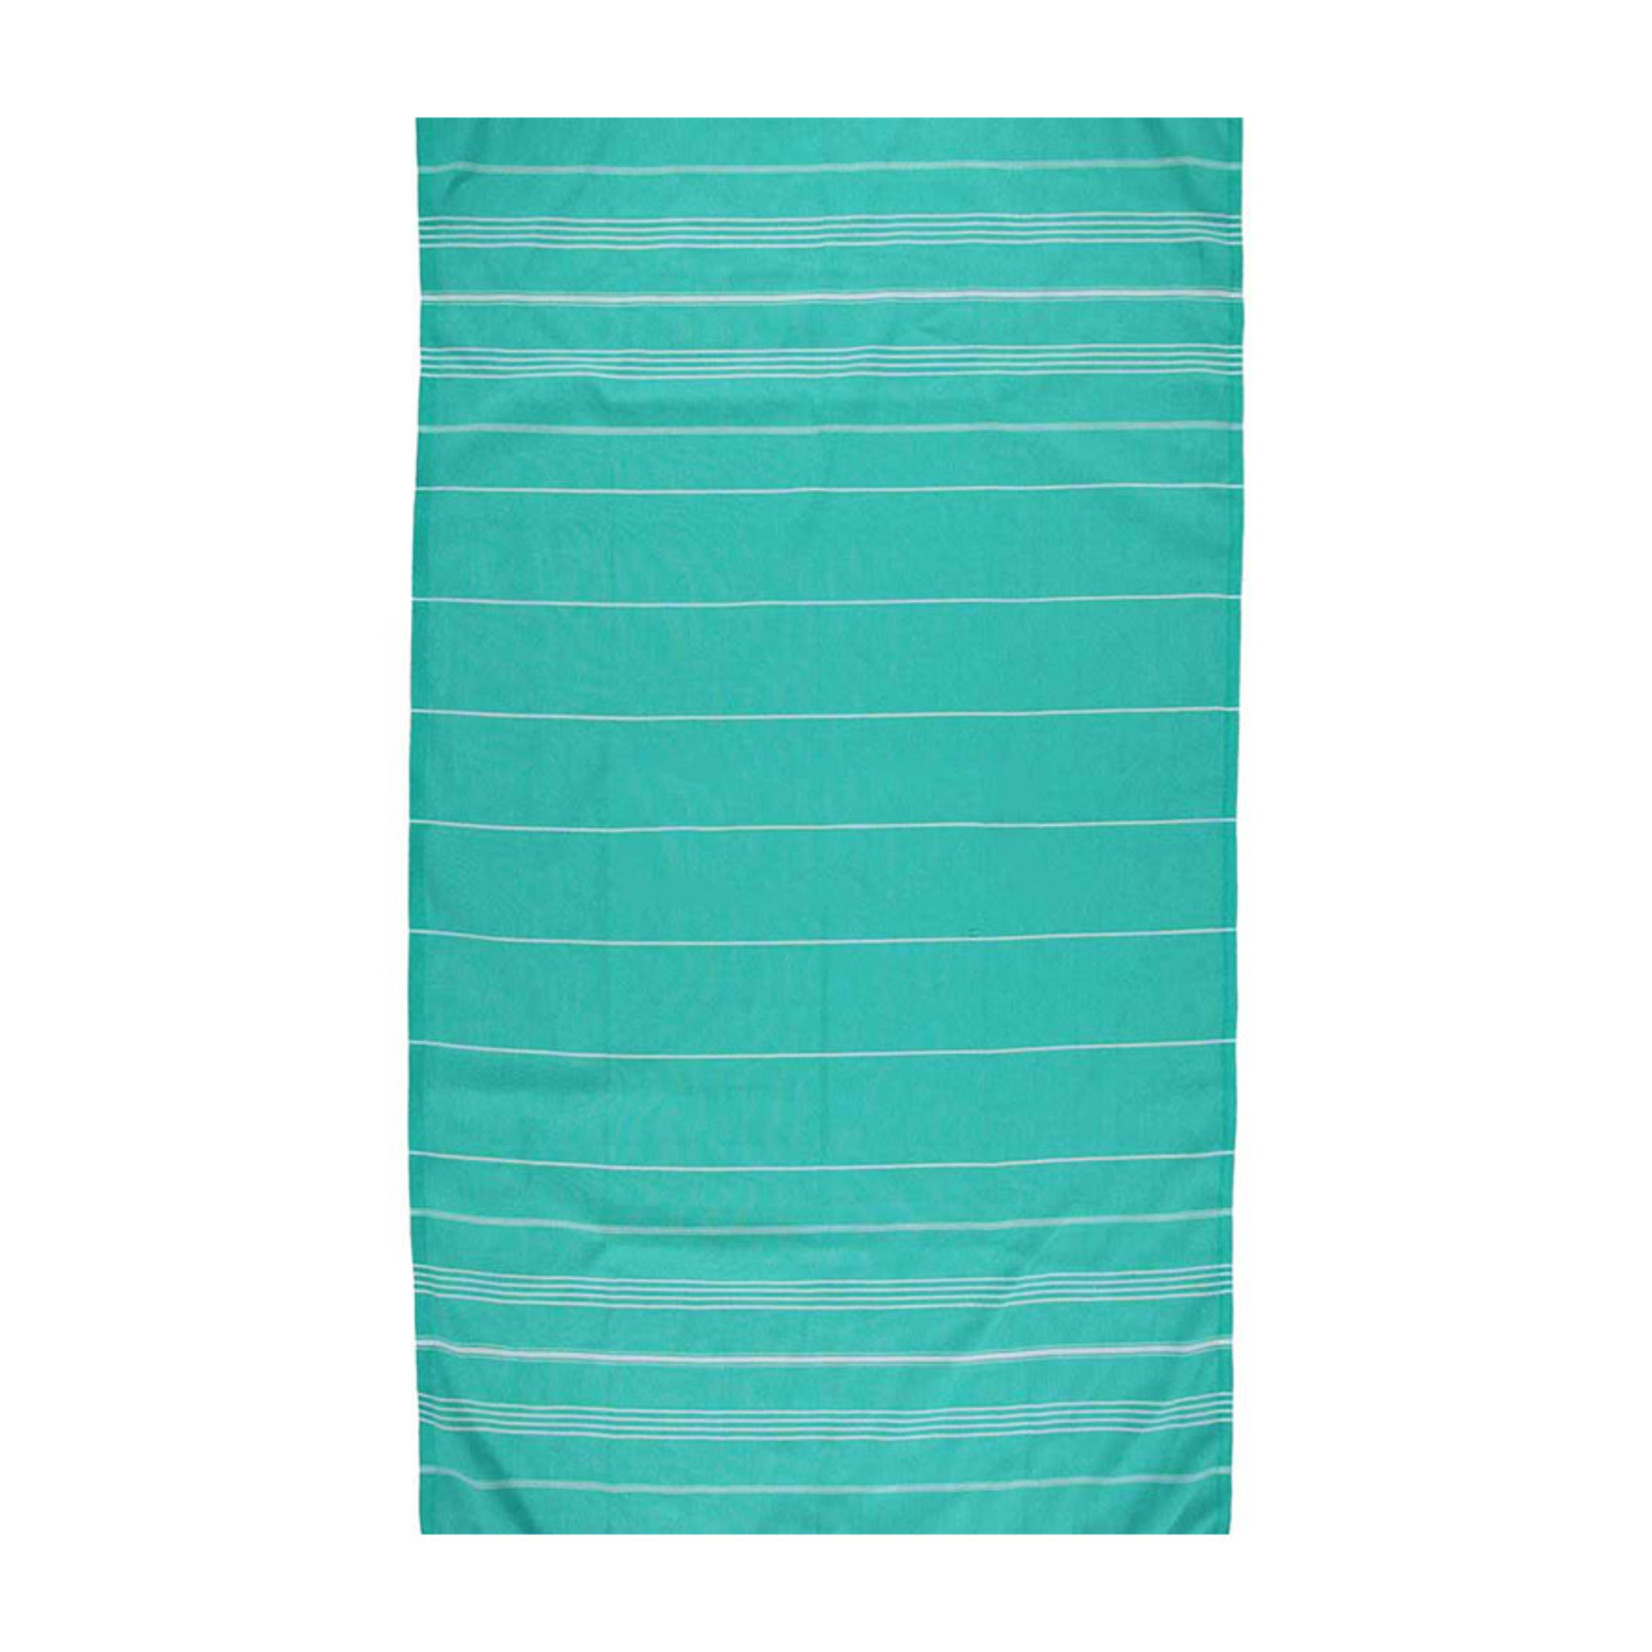 Riviera Towel Company Essential Turkish Towel